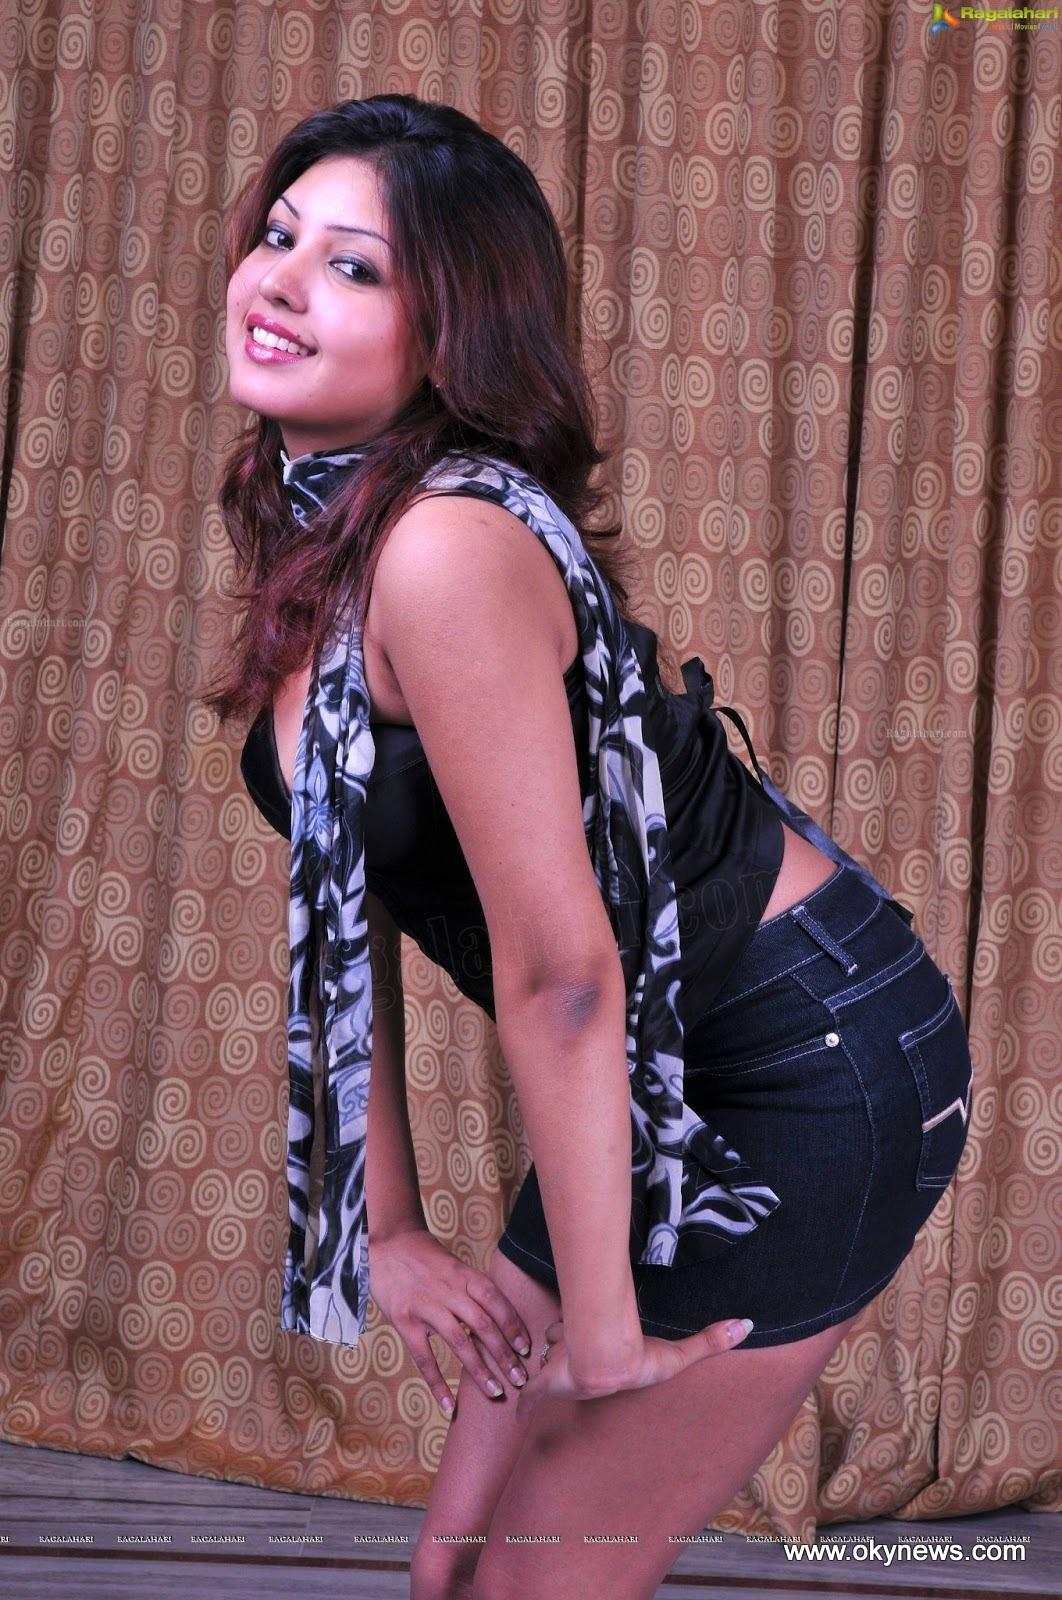 Komal Jha Latest Hot Photoshoot Stills#1 13 images Ado4WdQV